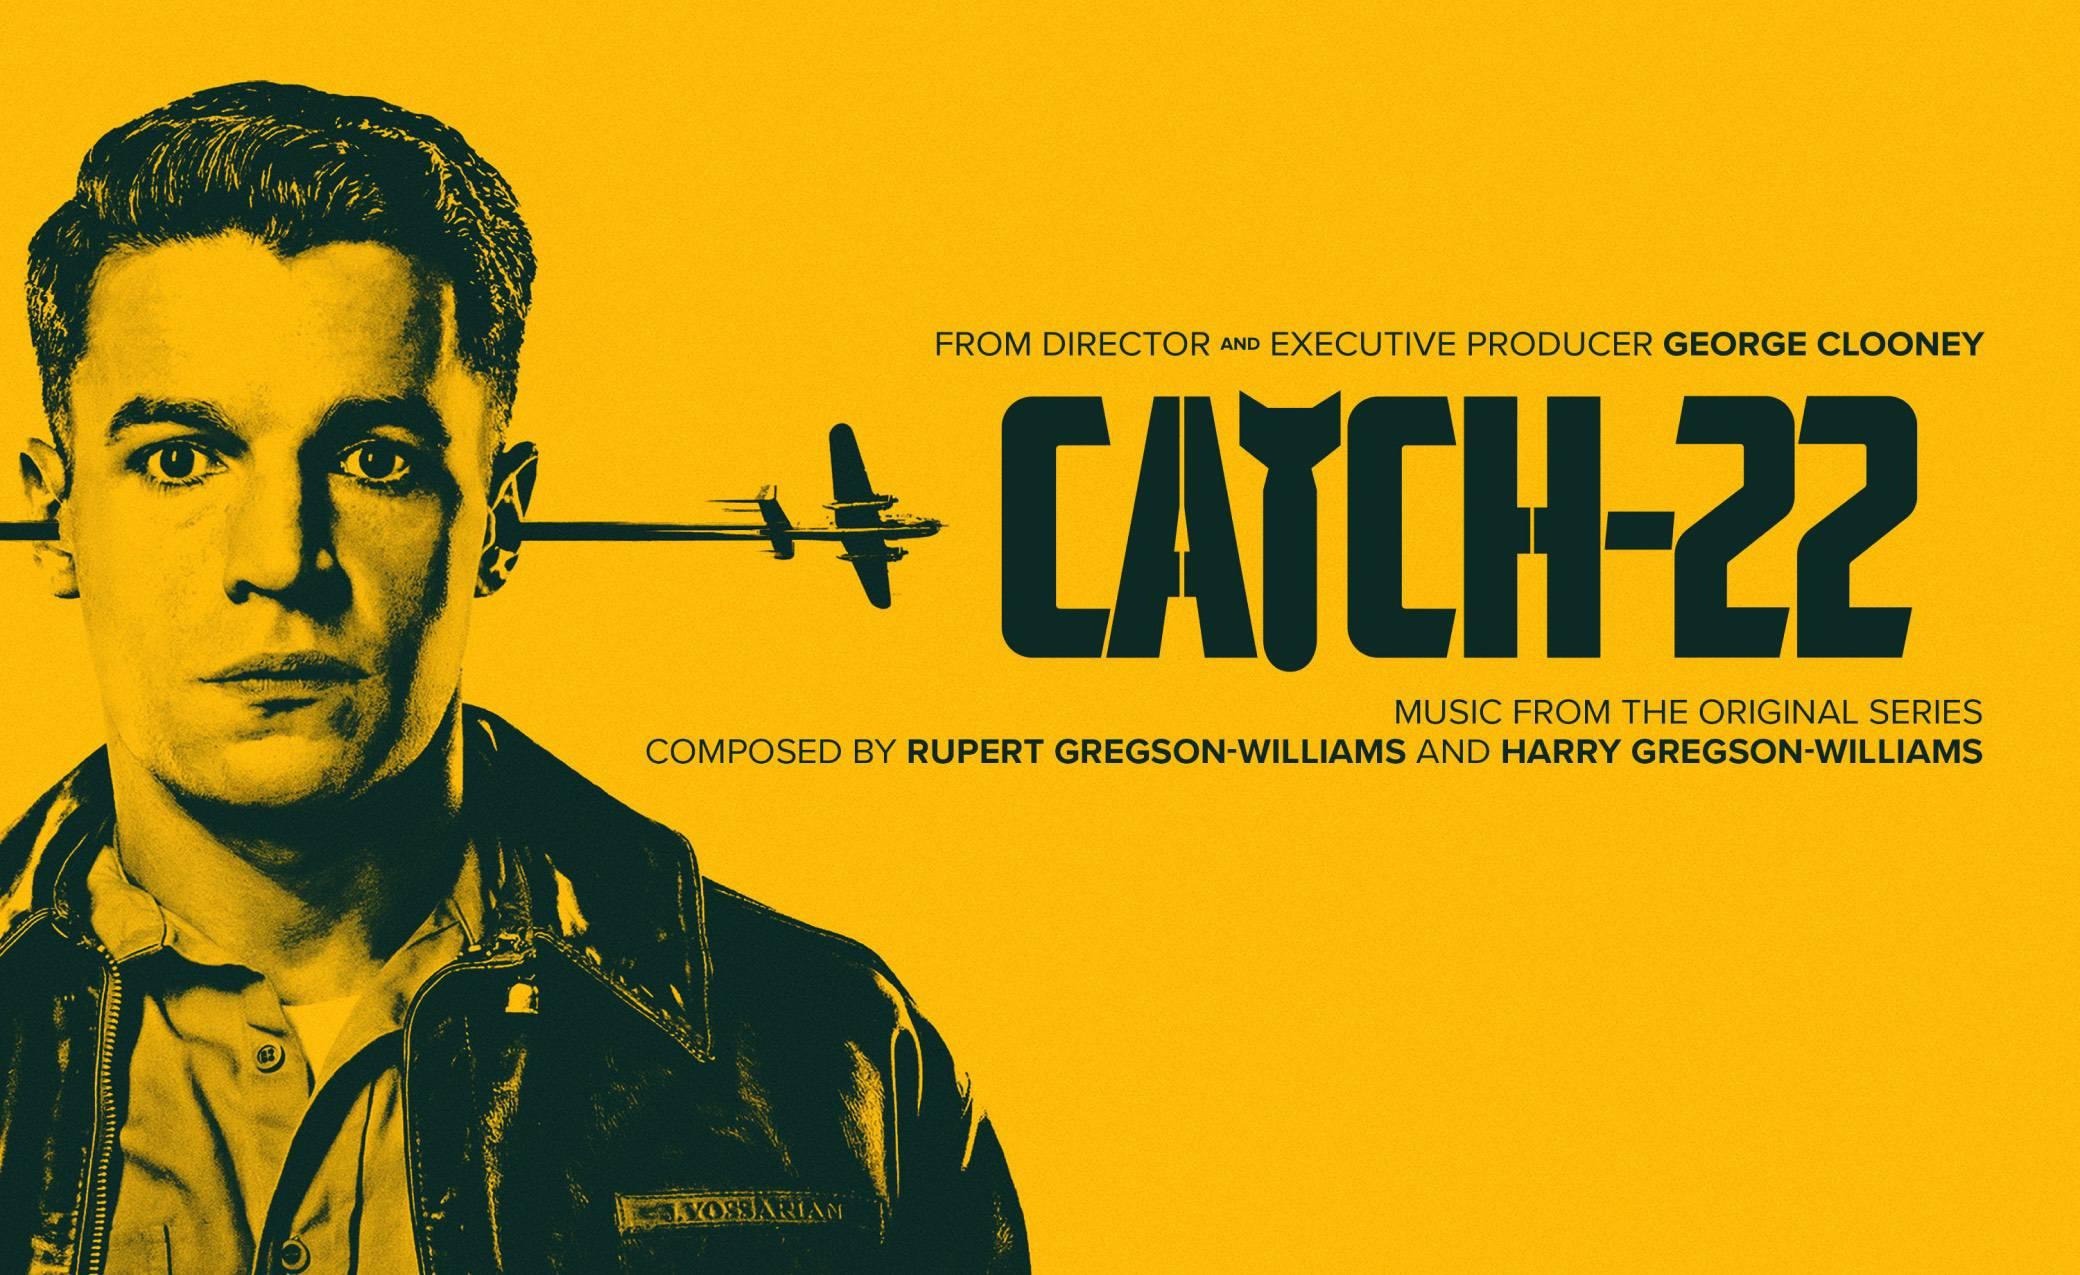 catch22 image